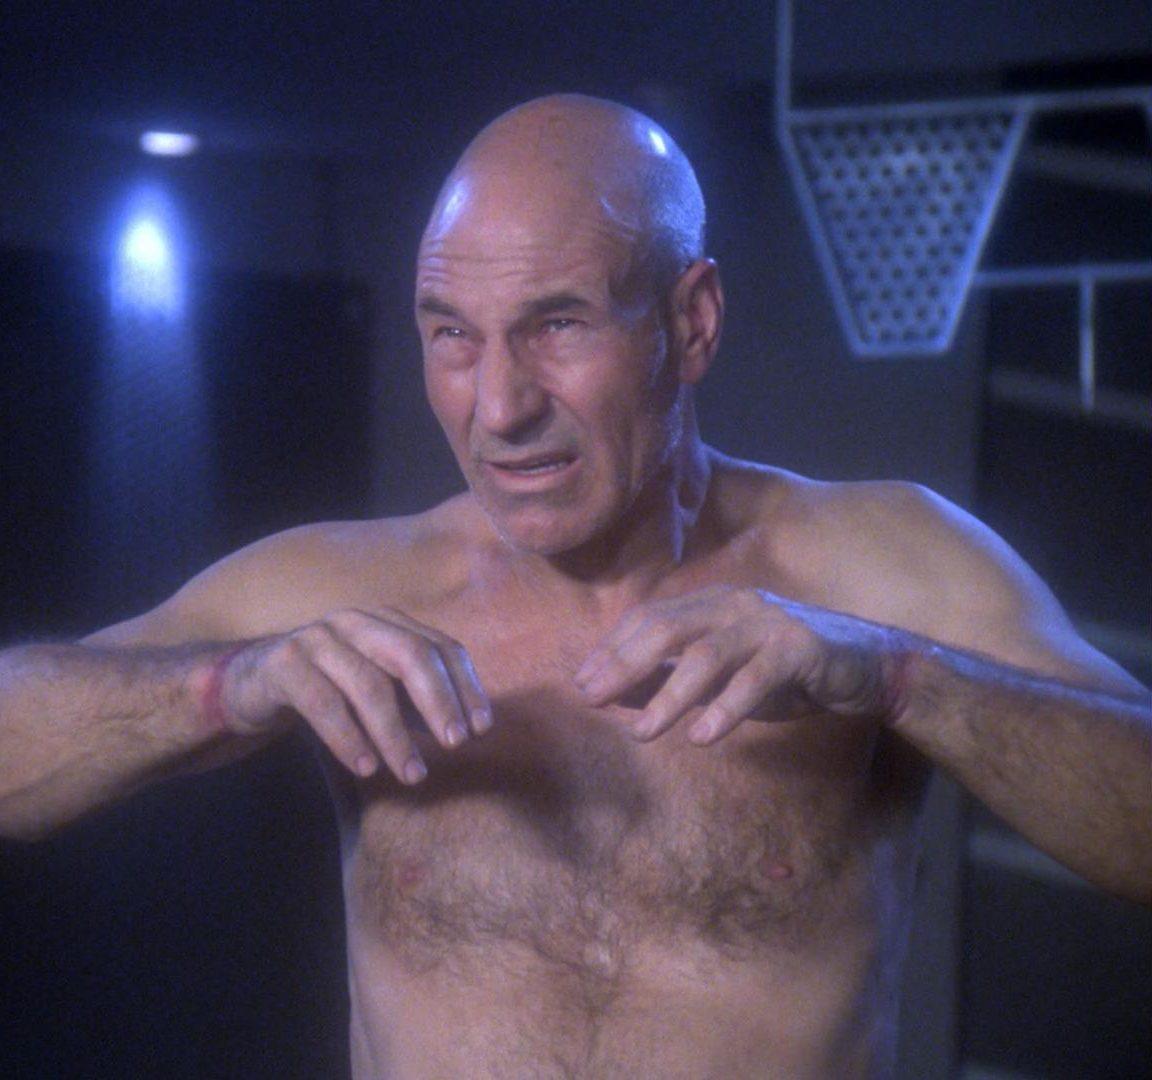 1 9 e1615282482211 30 Intergalactic Facts About Star Trek: The Next Generation